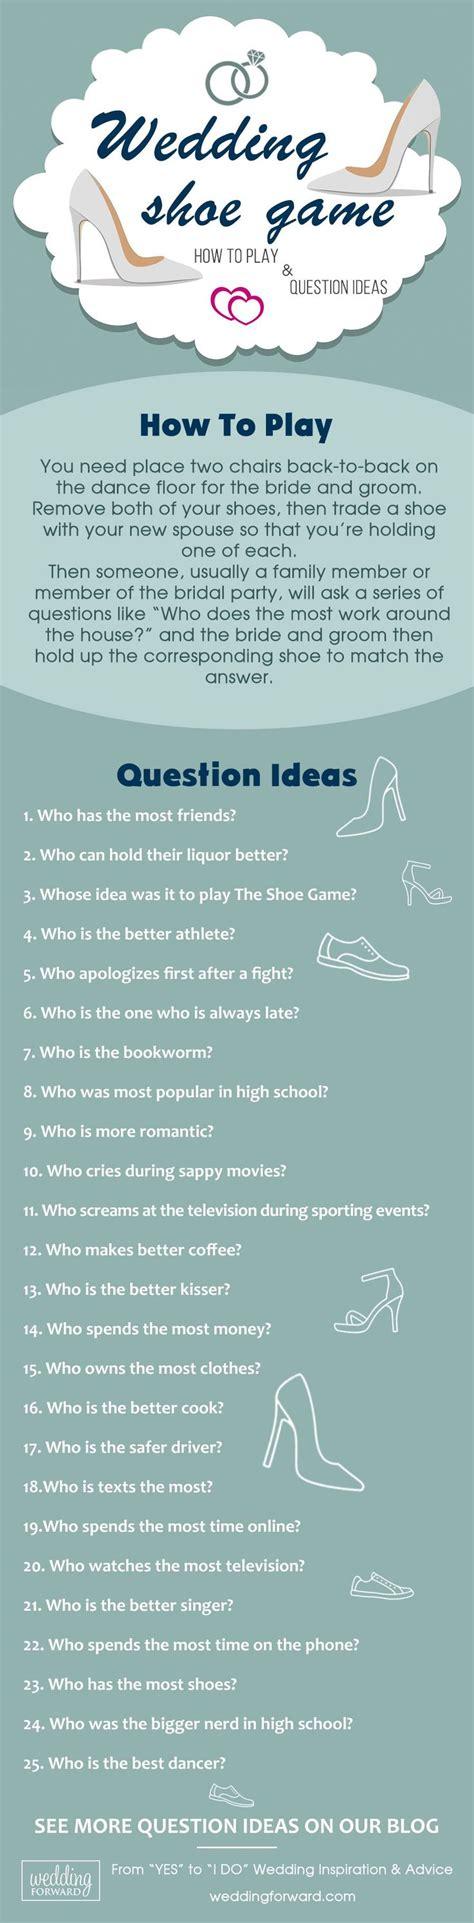 wedding games ideas best 25 bridal party games ideas on wedding party games ideas wedding